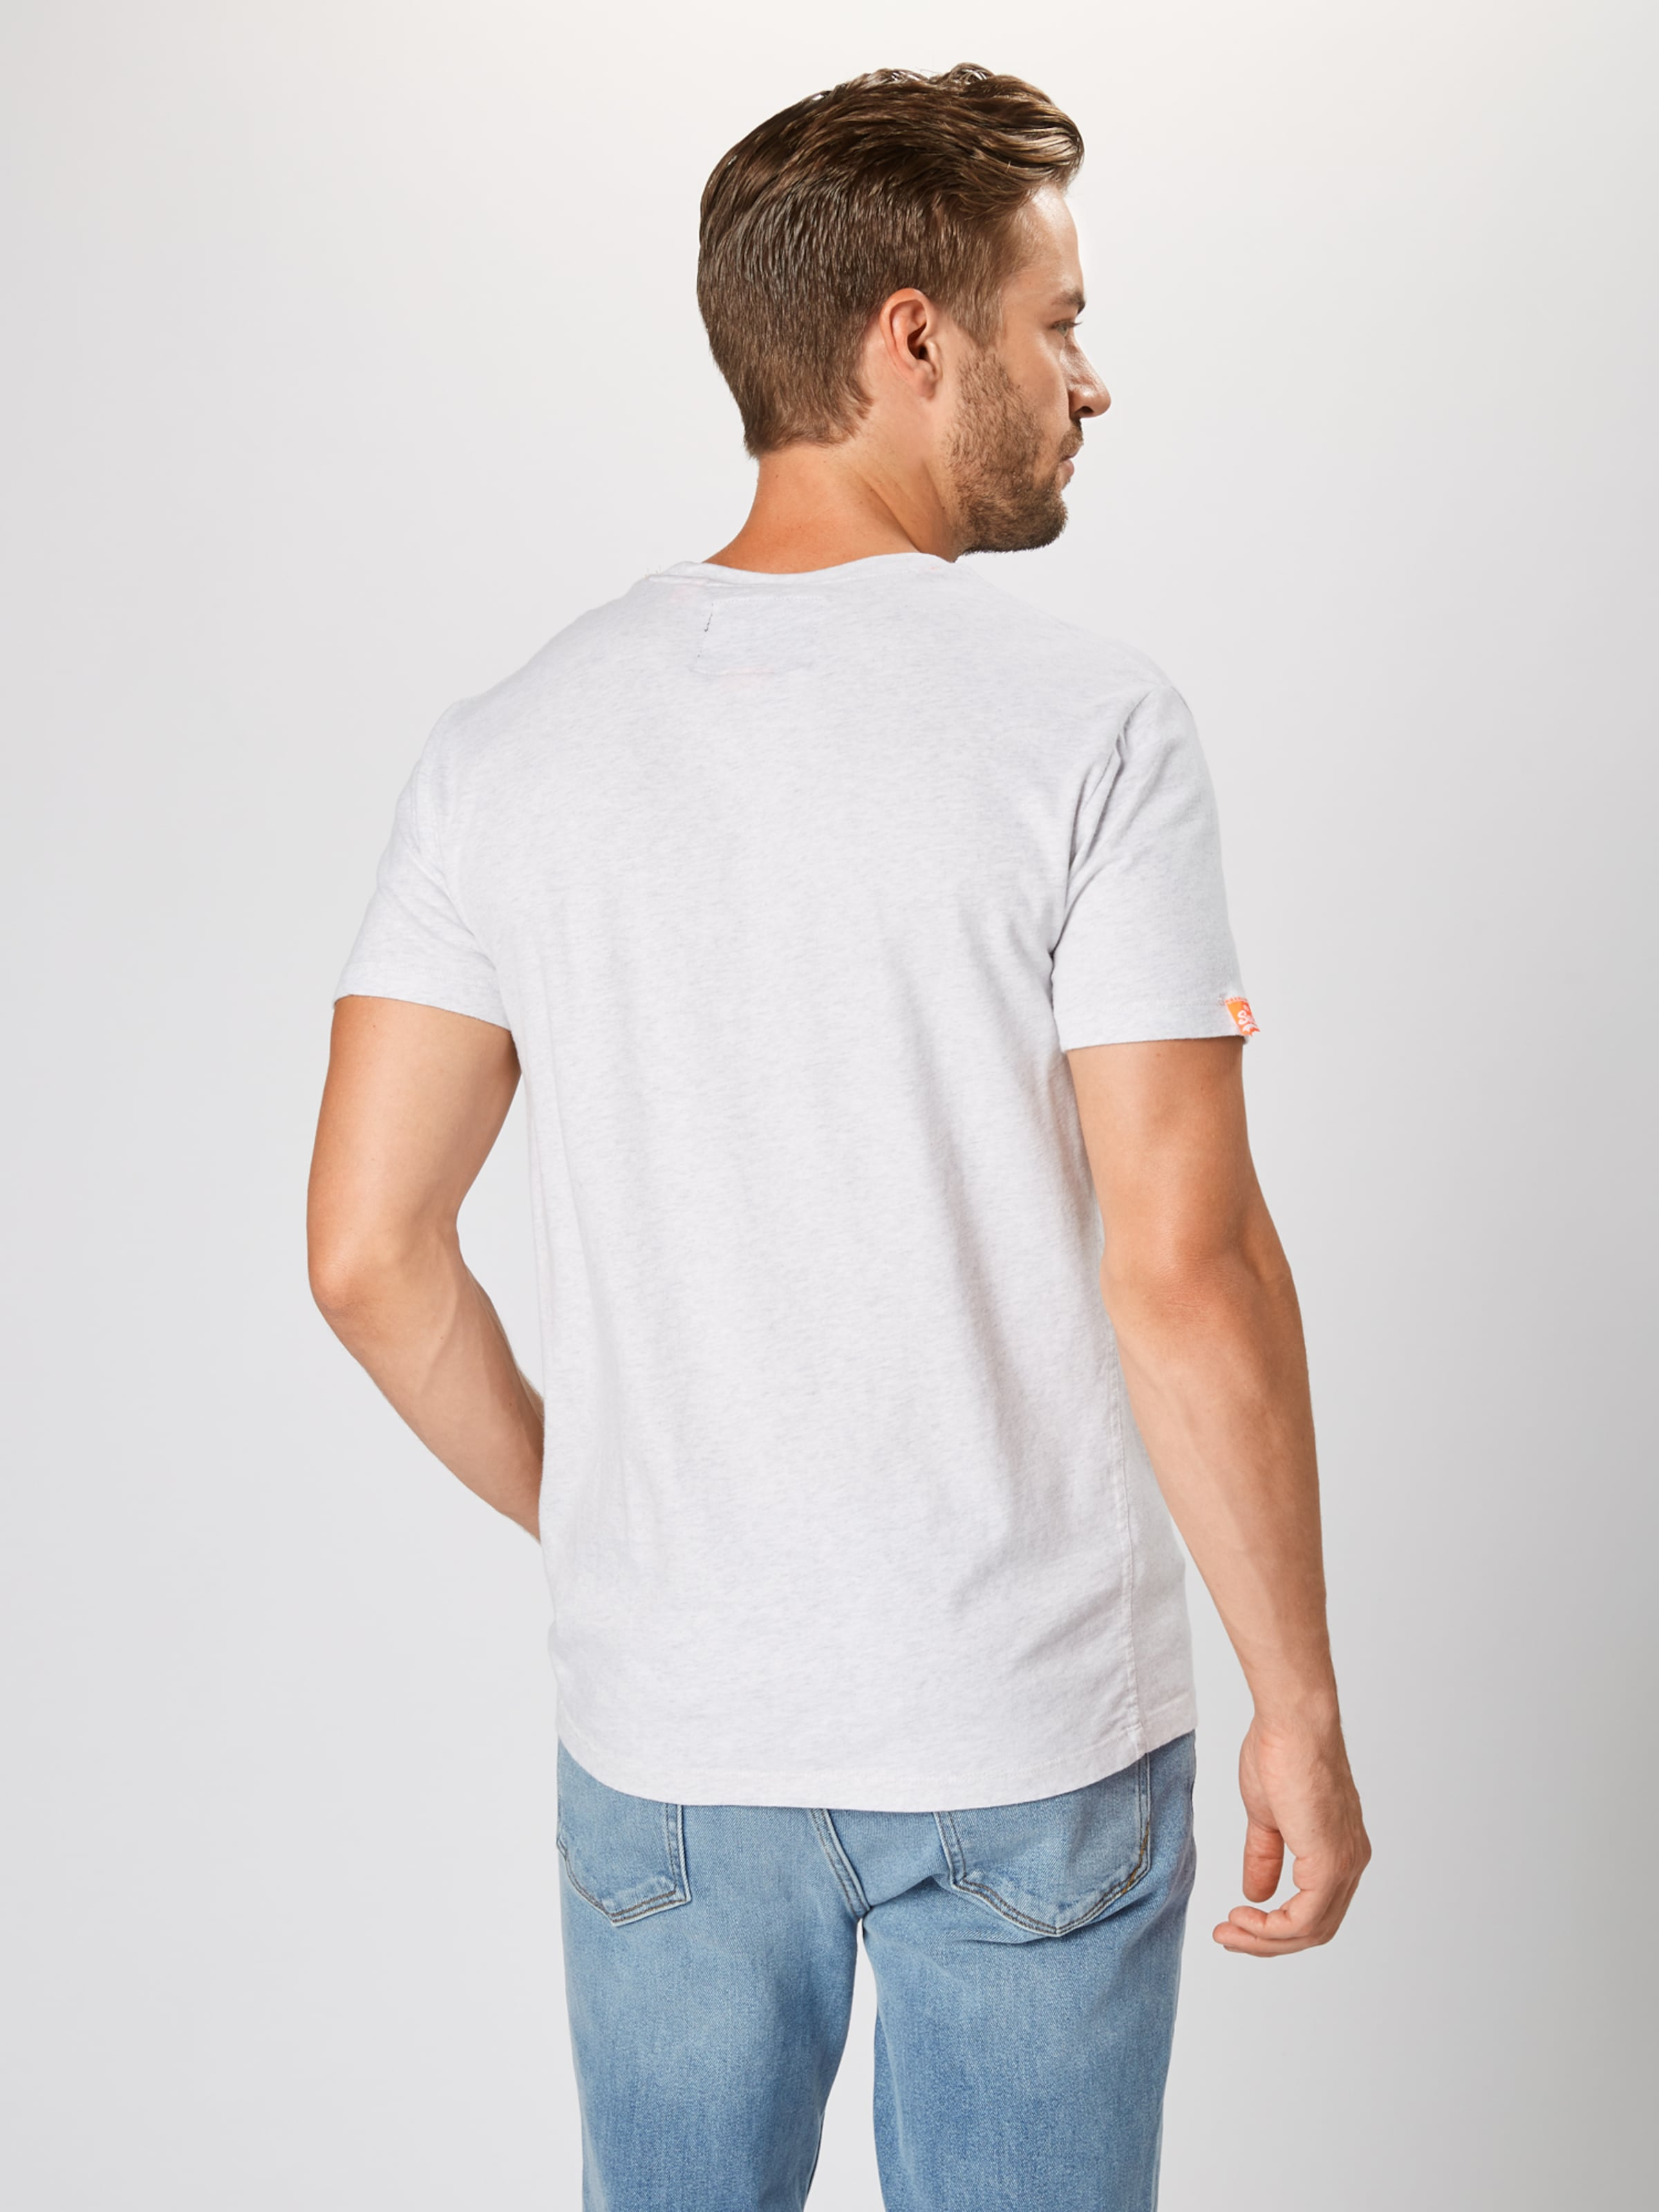 Tee' Vintage Label Gris Superdry Clair T 'orange Embroidery En shirt lKTFJuc31